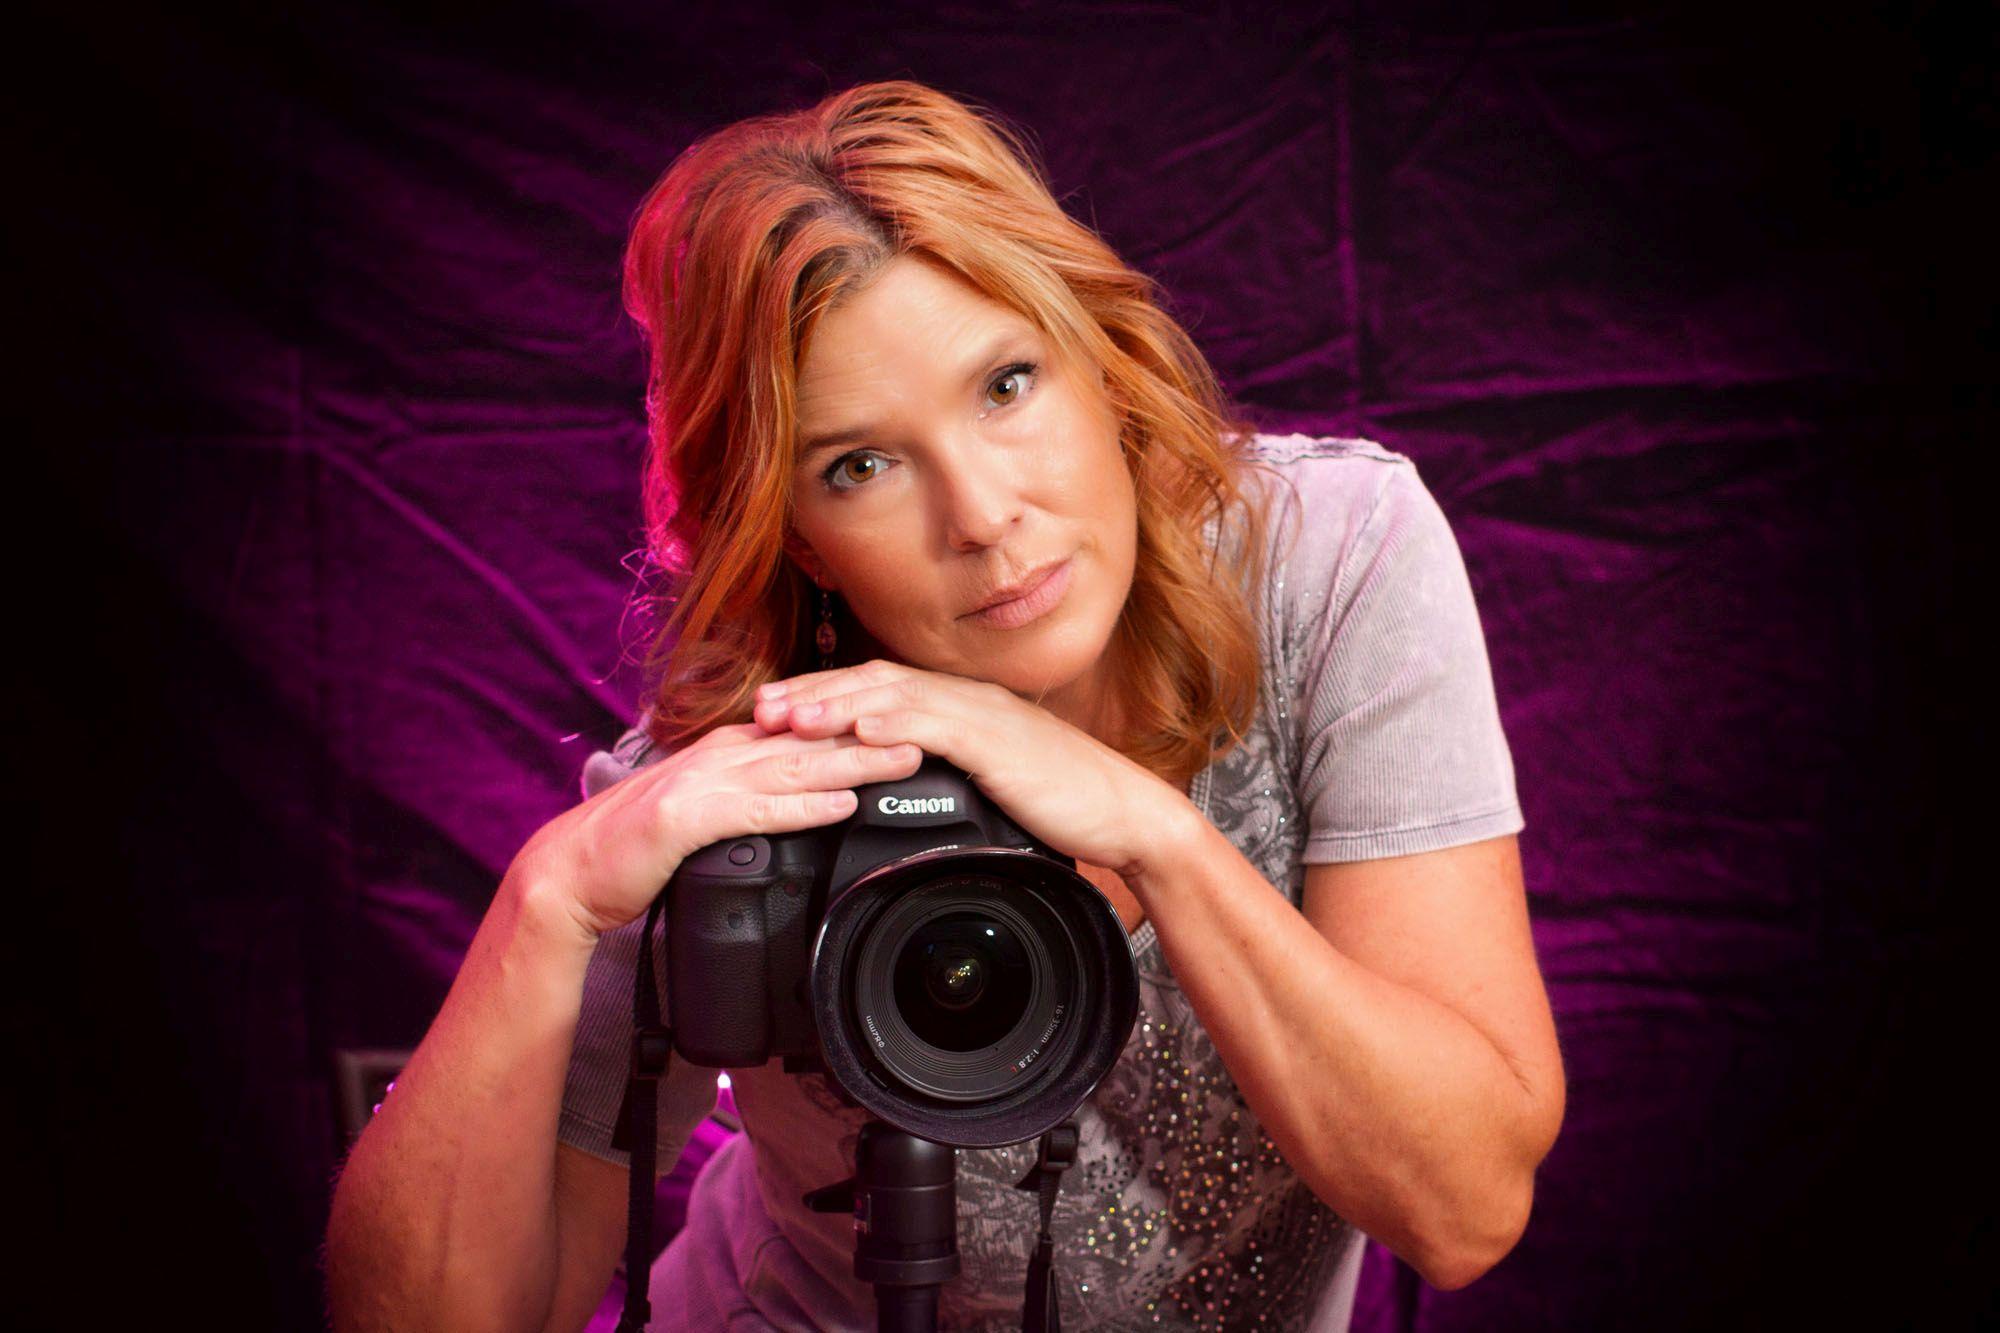 Jennifer Lamerand